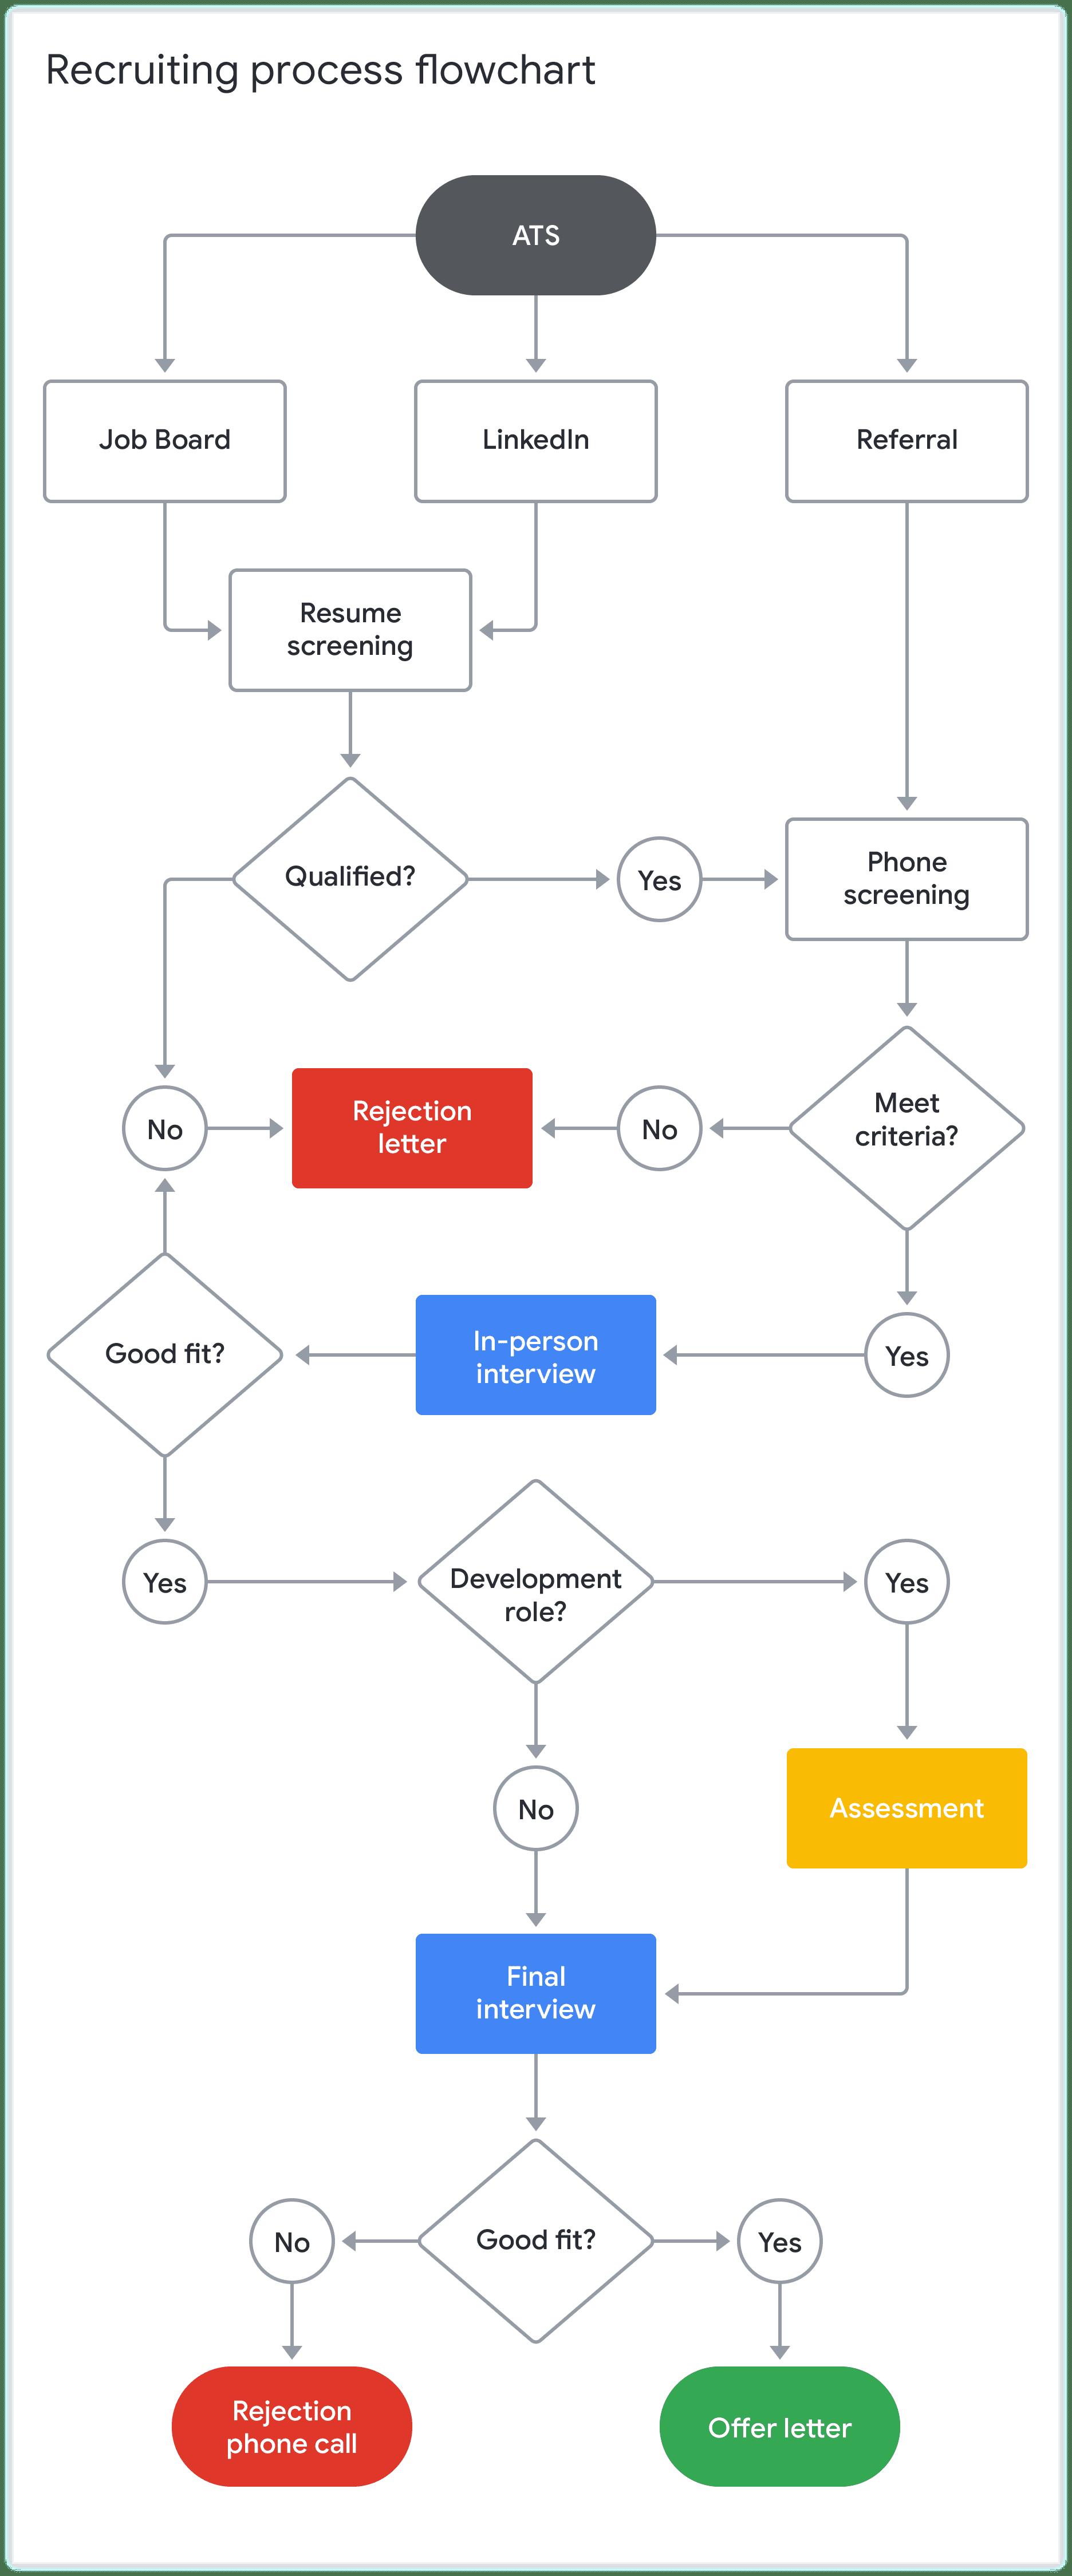 How To Build A Recruitment Process Flowchart